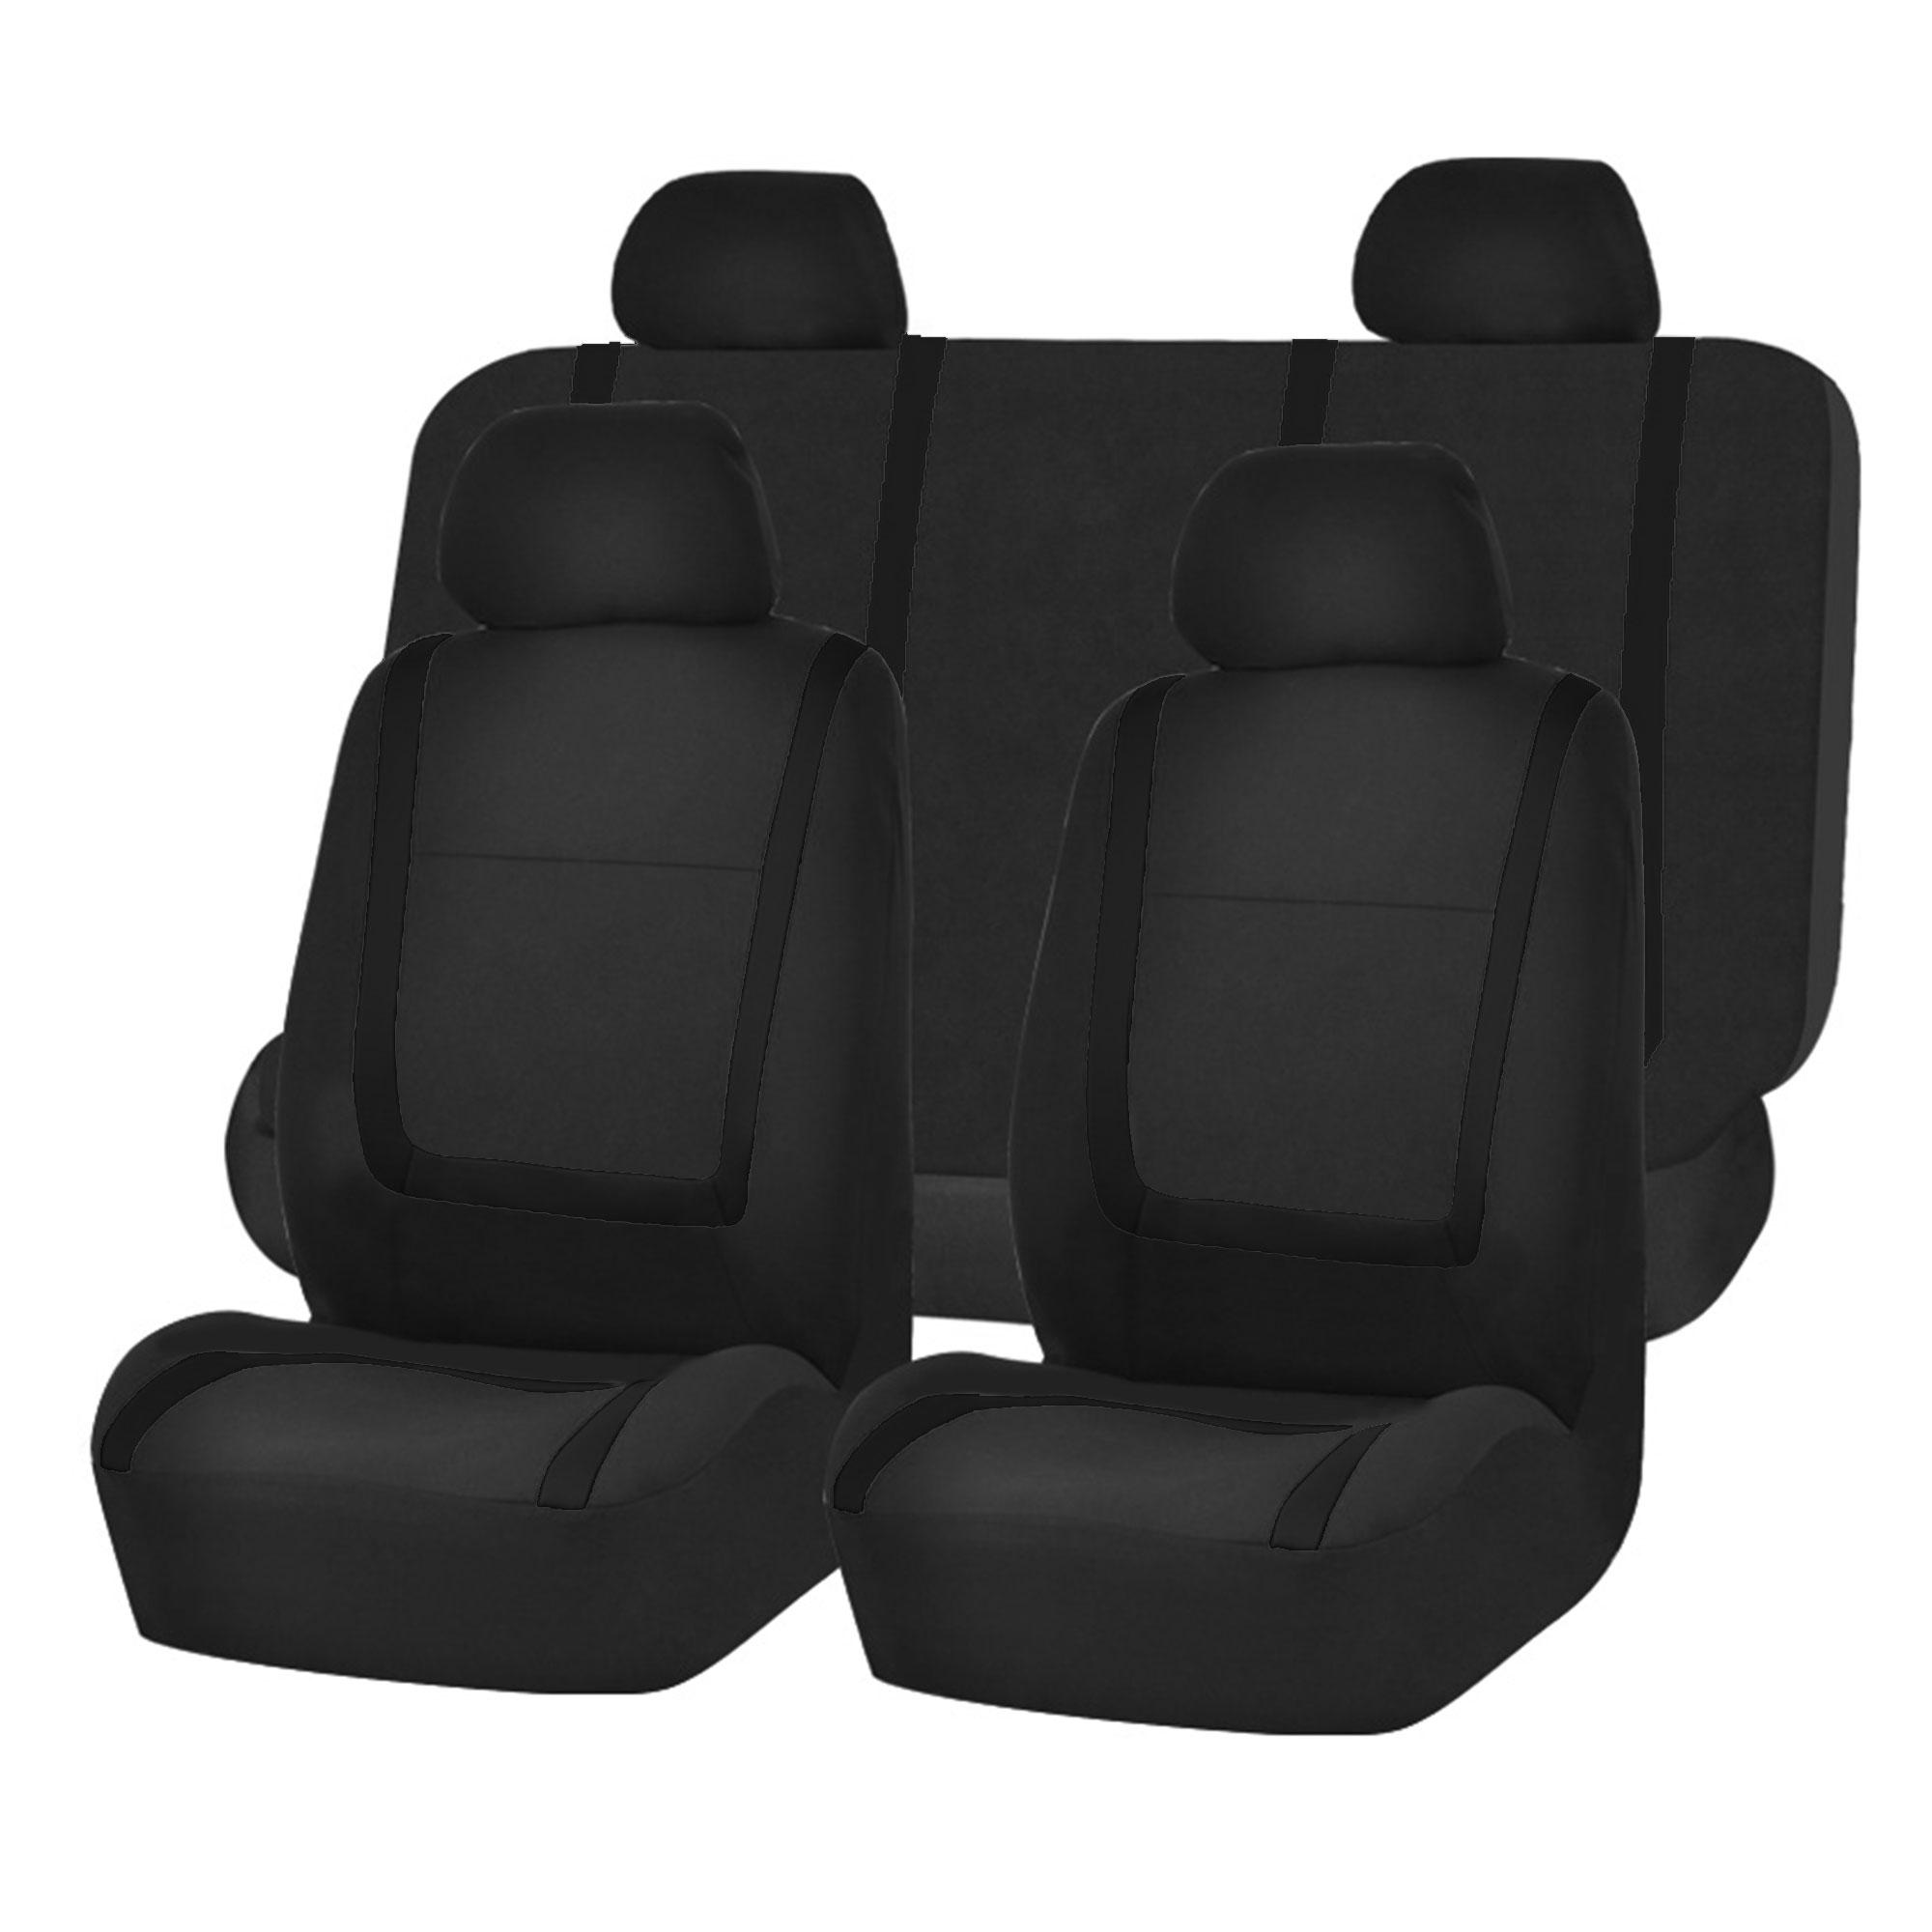 Auto Seat Covers for Car Sedan Truck Van Universal Seat Covers 12 Colors Black